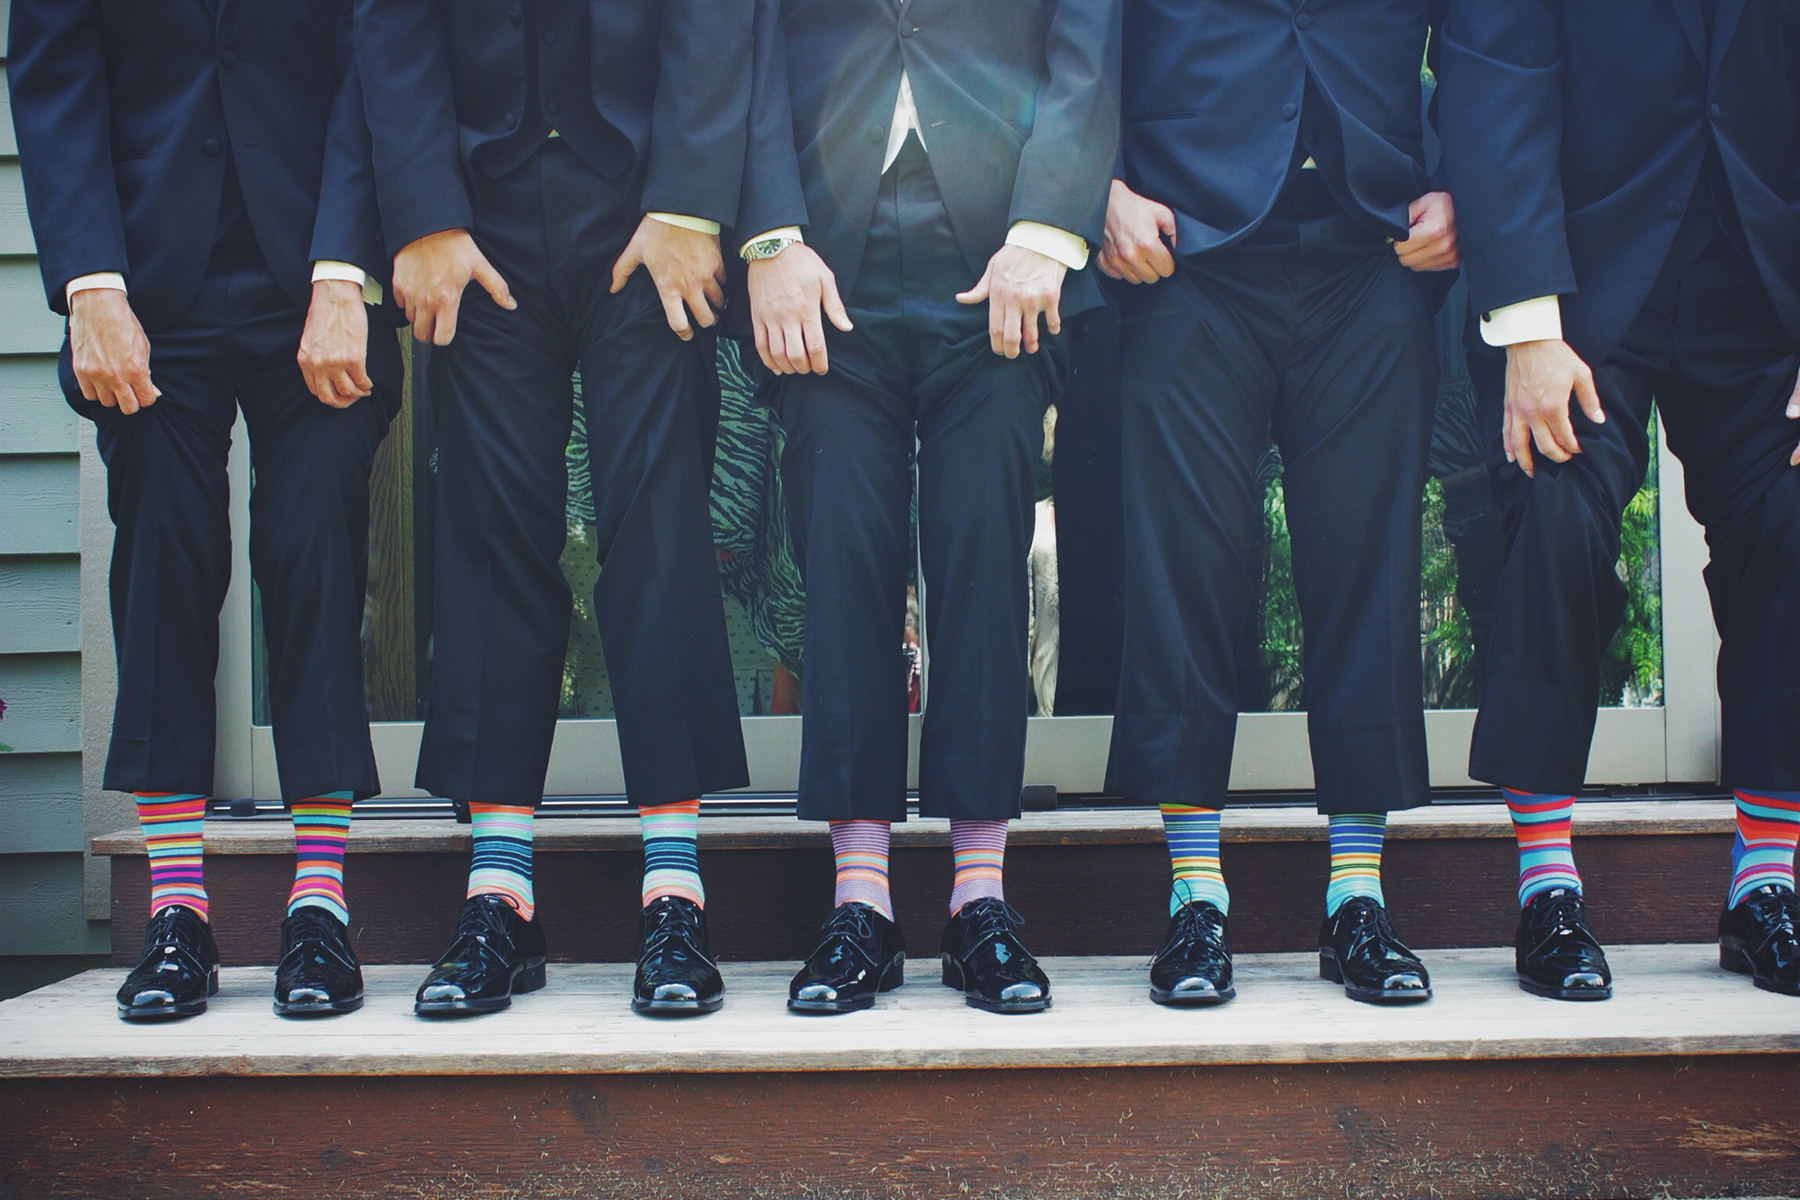 Skarpetki – bielizna czy modny dodatek?